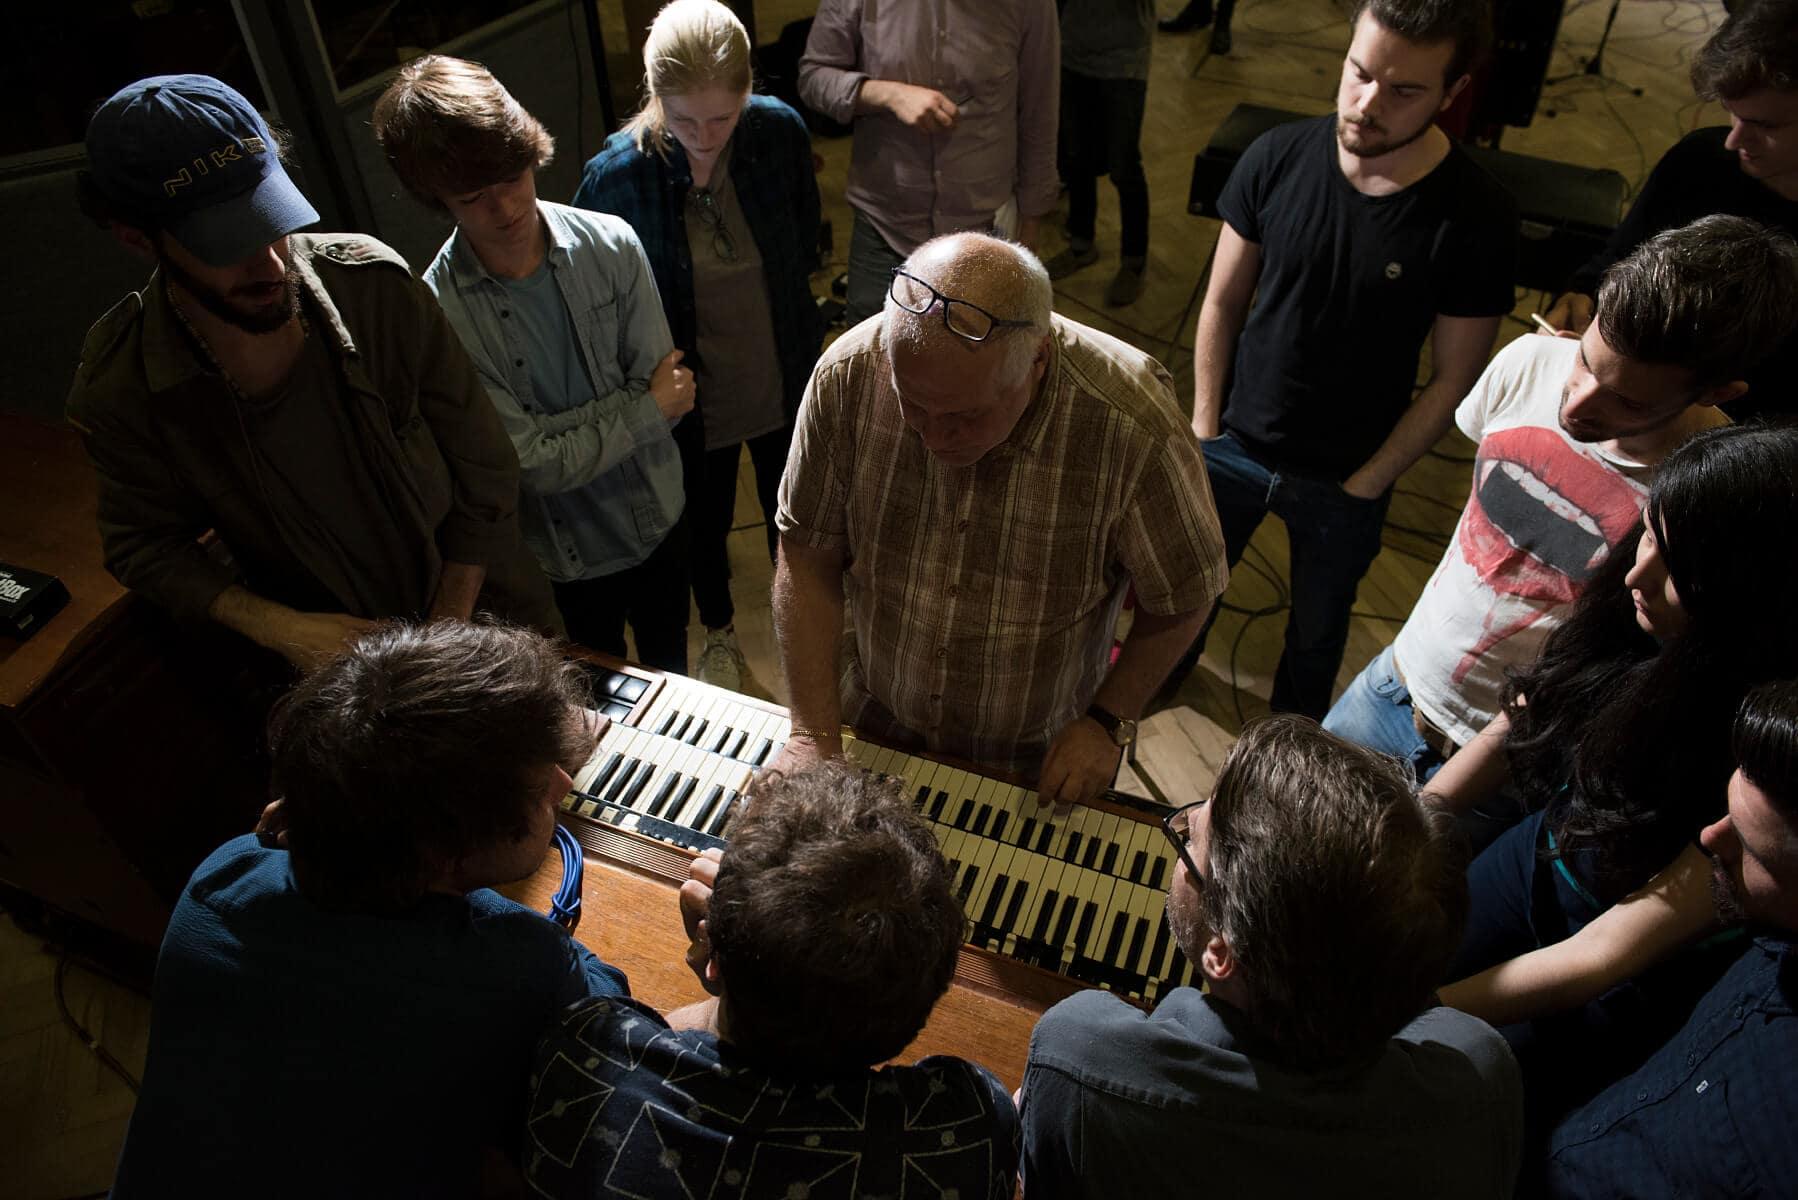 Set up the Hammond organ